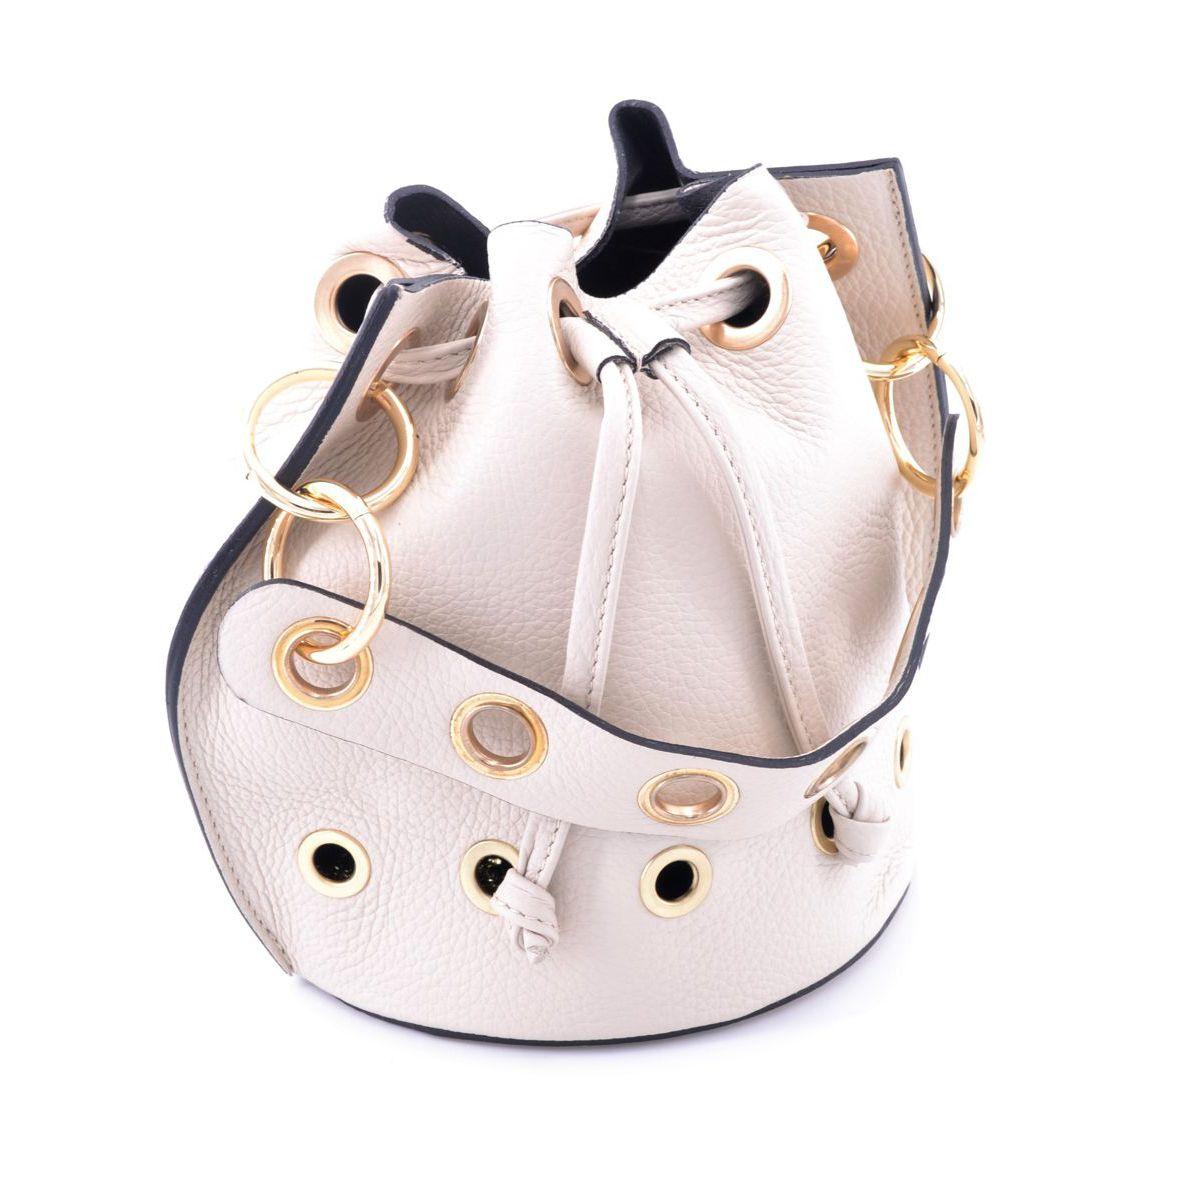 Mini leather bucket with shoulder strap Cream BRASS Workshop